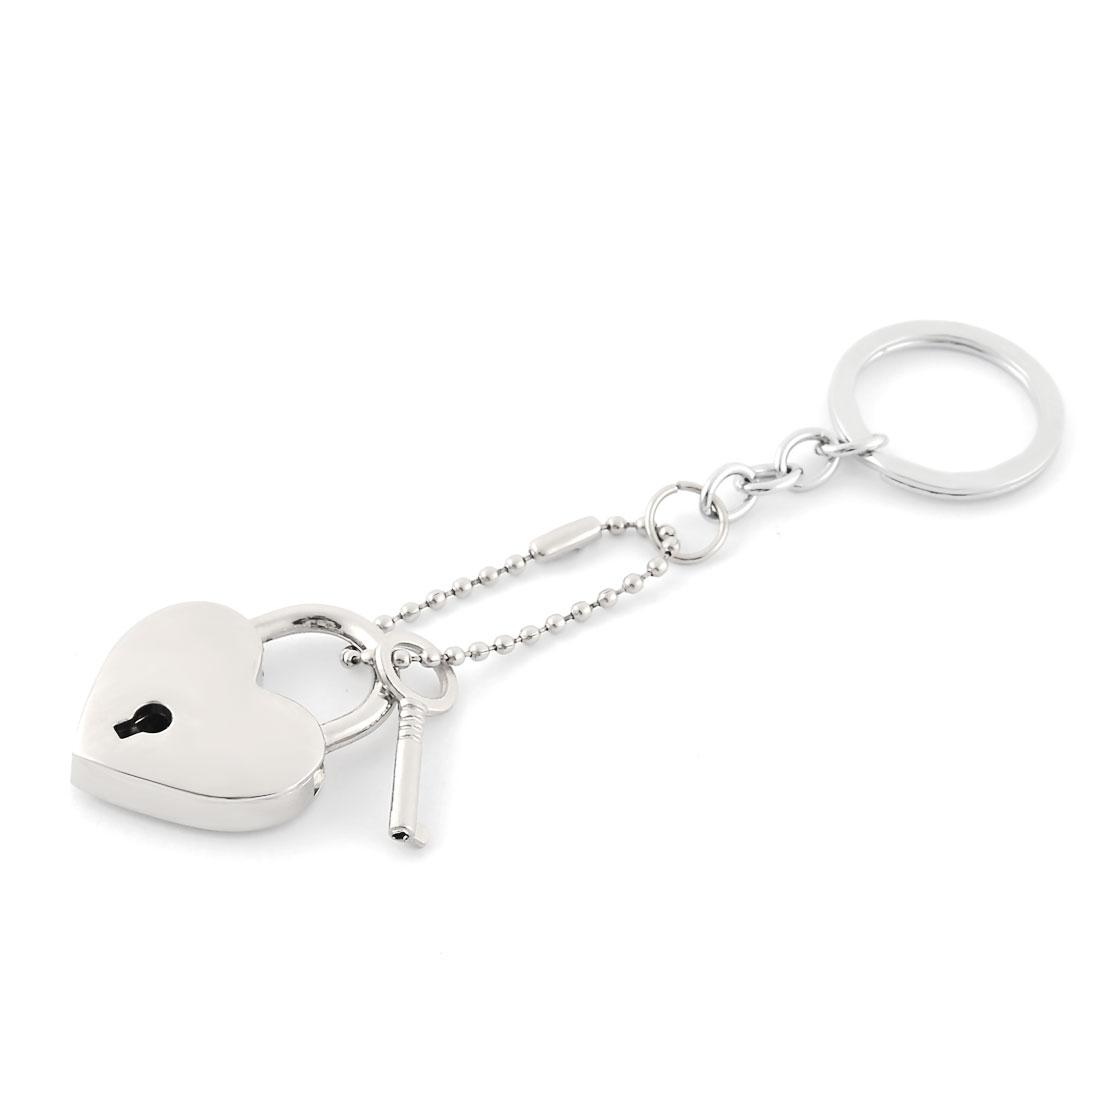 Bag Metal Heart Design Pendant Ornament Key Chain Silver Tone 12.9cm Length